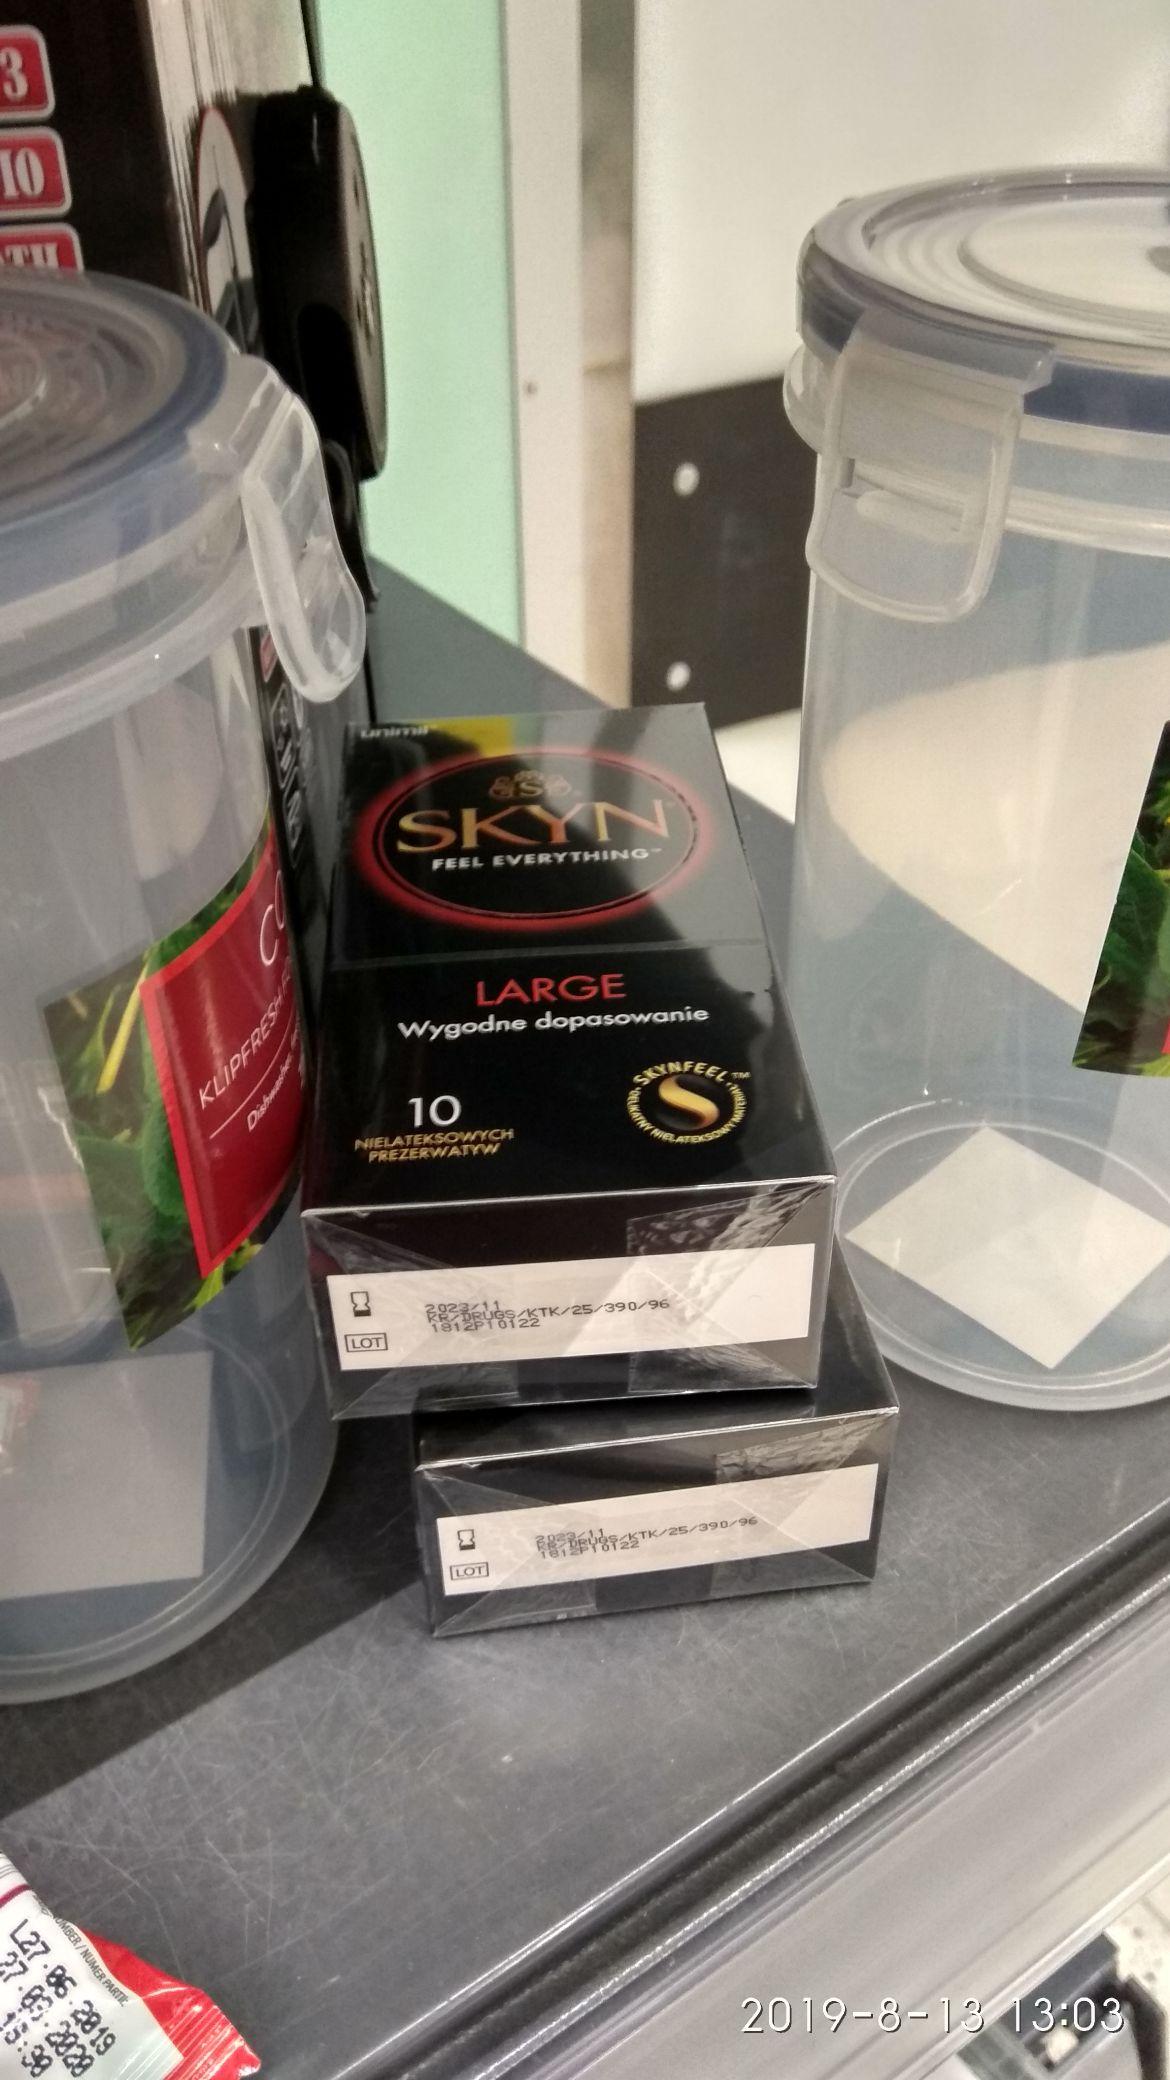 Prezerwatywy SKYN LARGE 10 szt. TESCO LUBLIN